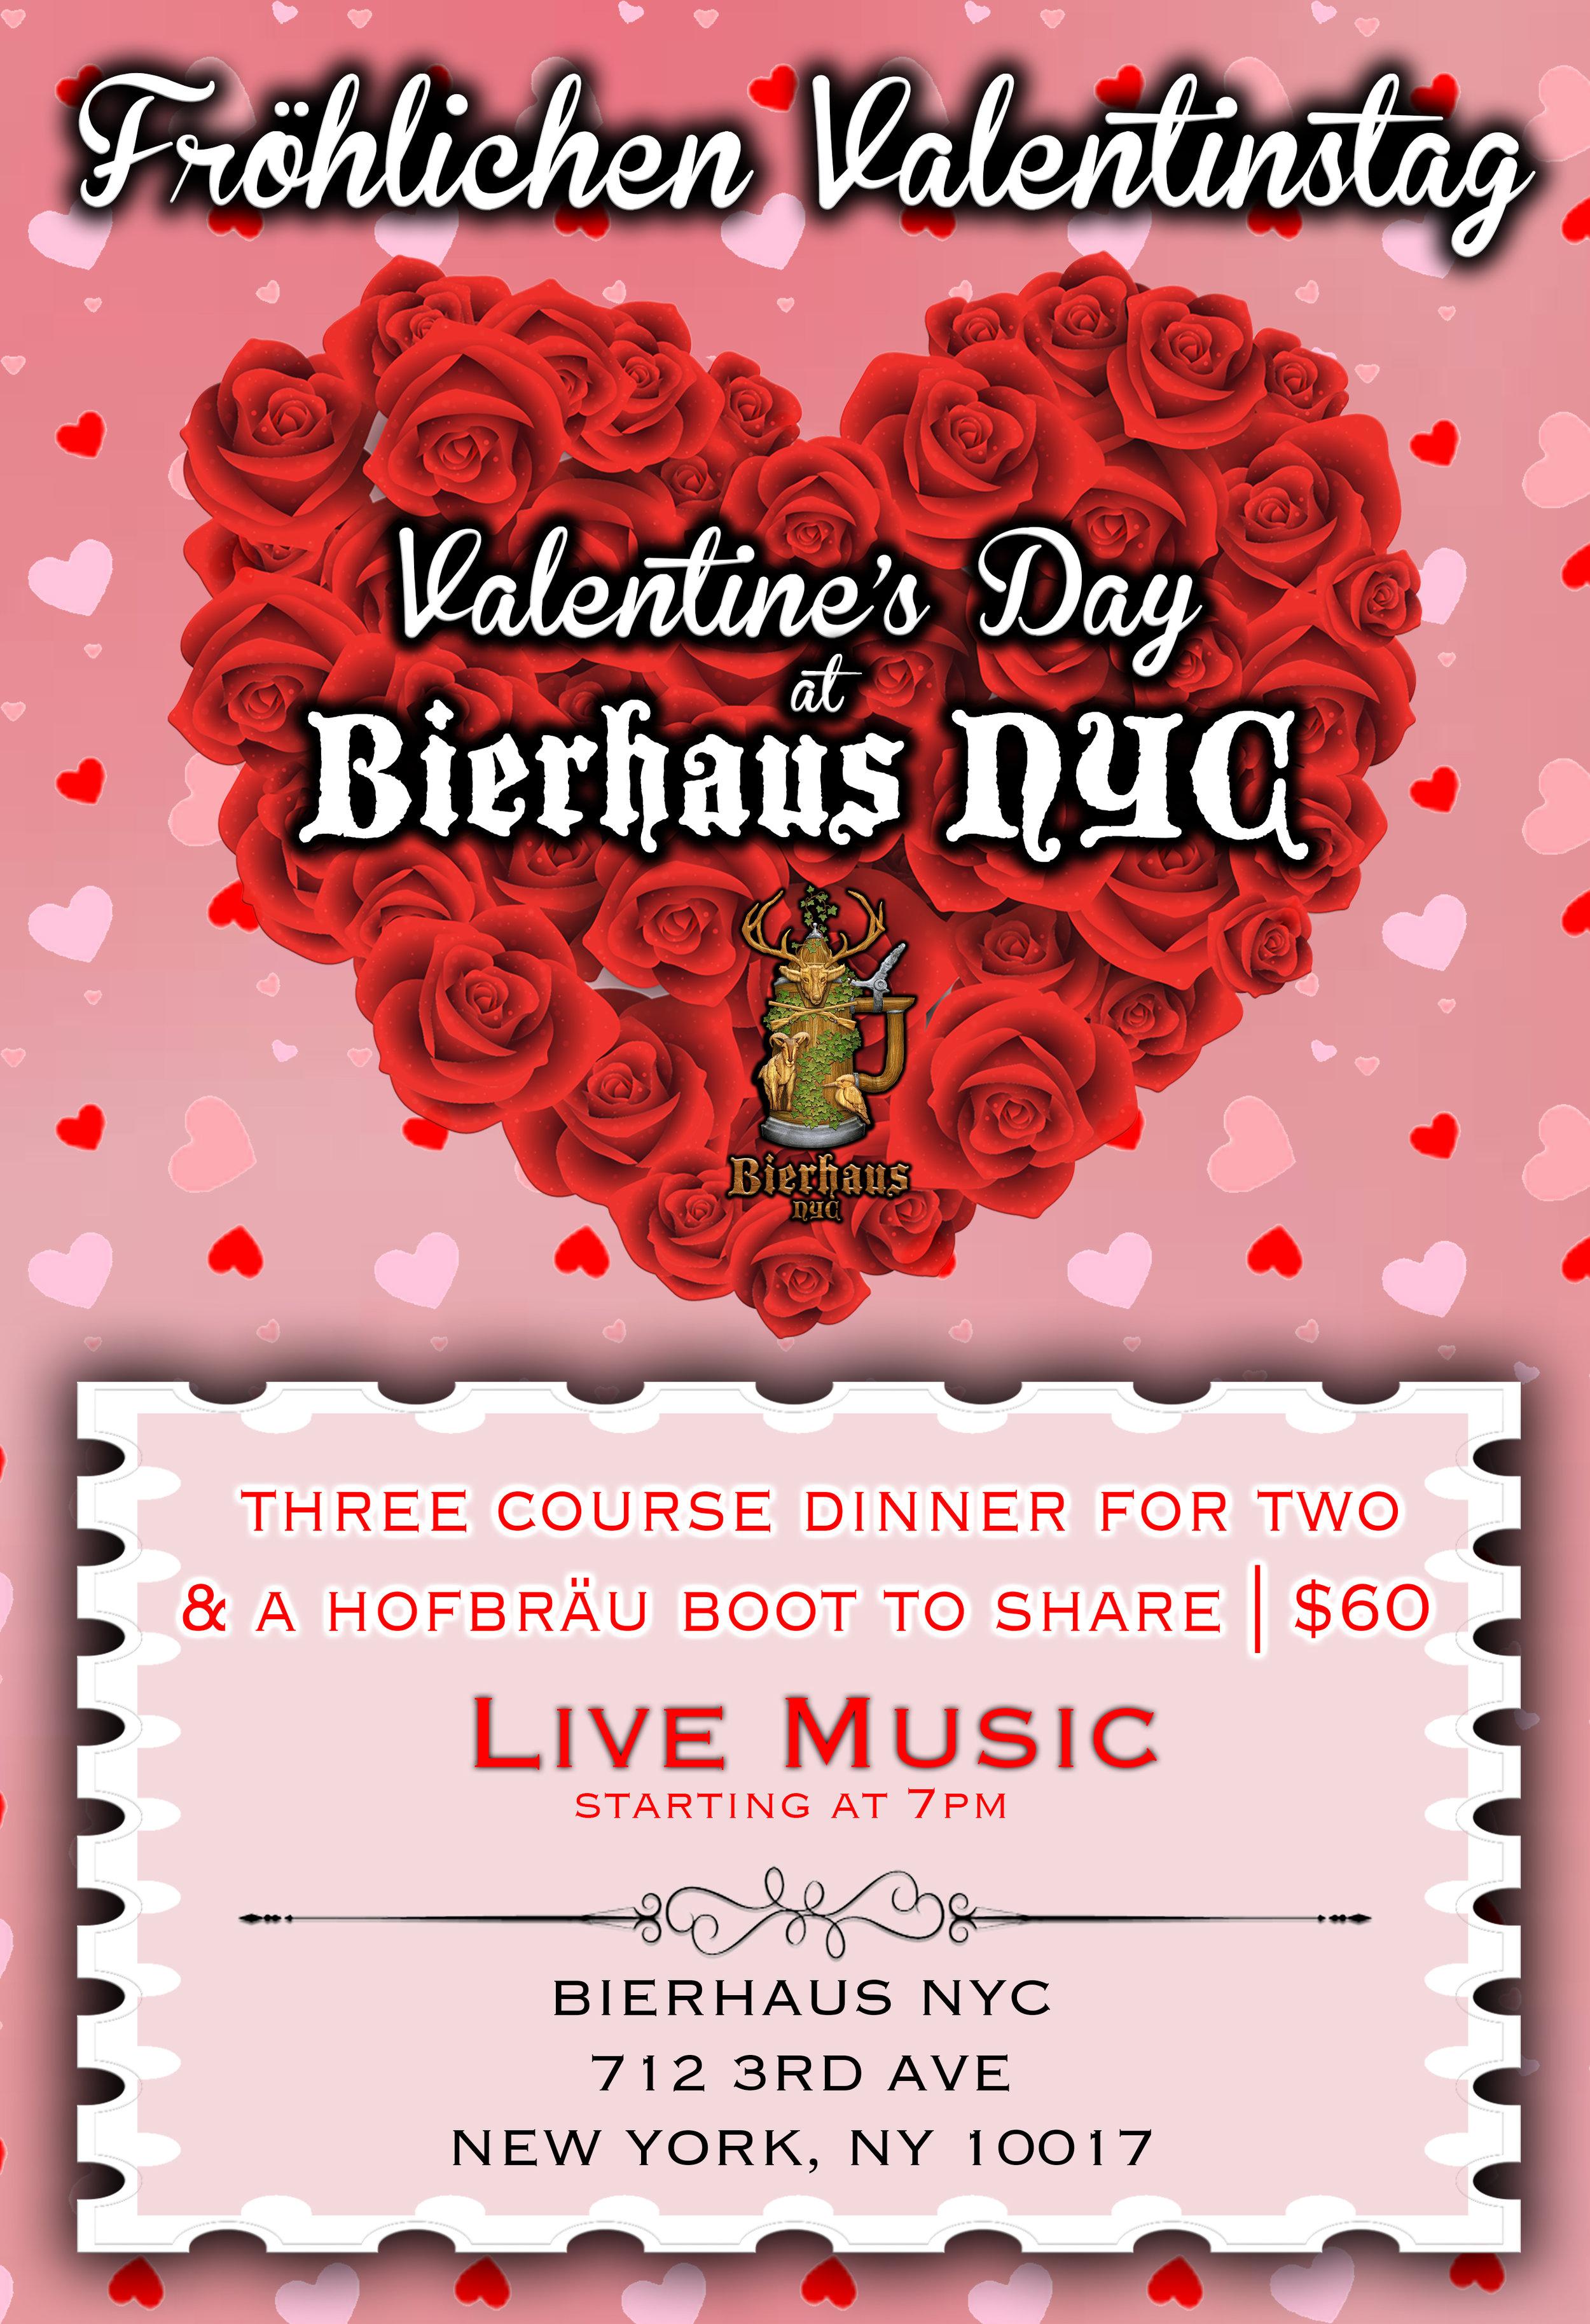 ValentinesDay17.jpg